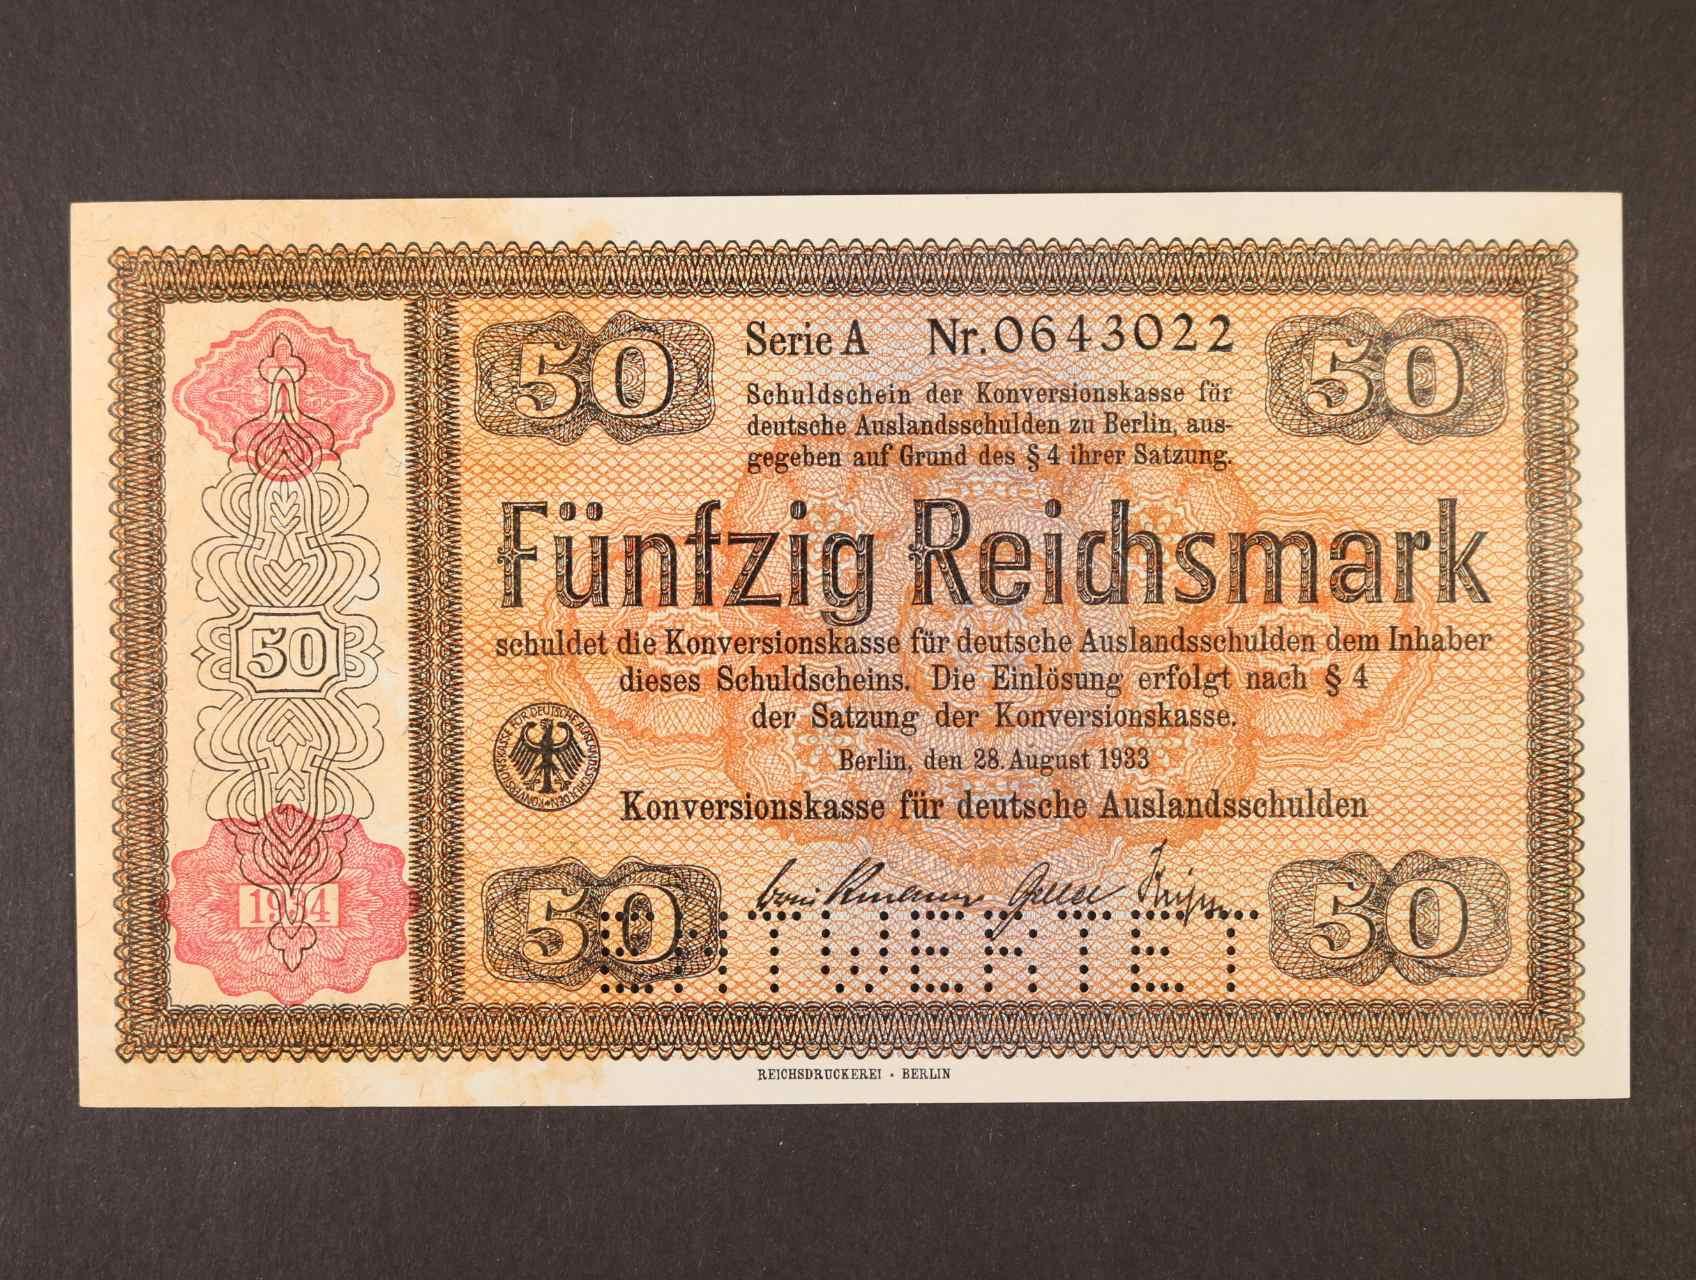 50 RM 28.8.1933 série A s přetiskem 1934  Konversionskassenschein, perforace ENTWERTET, Ro. 712E1